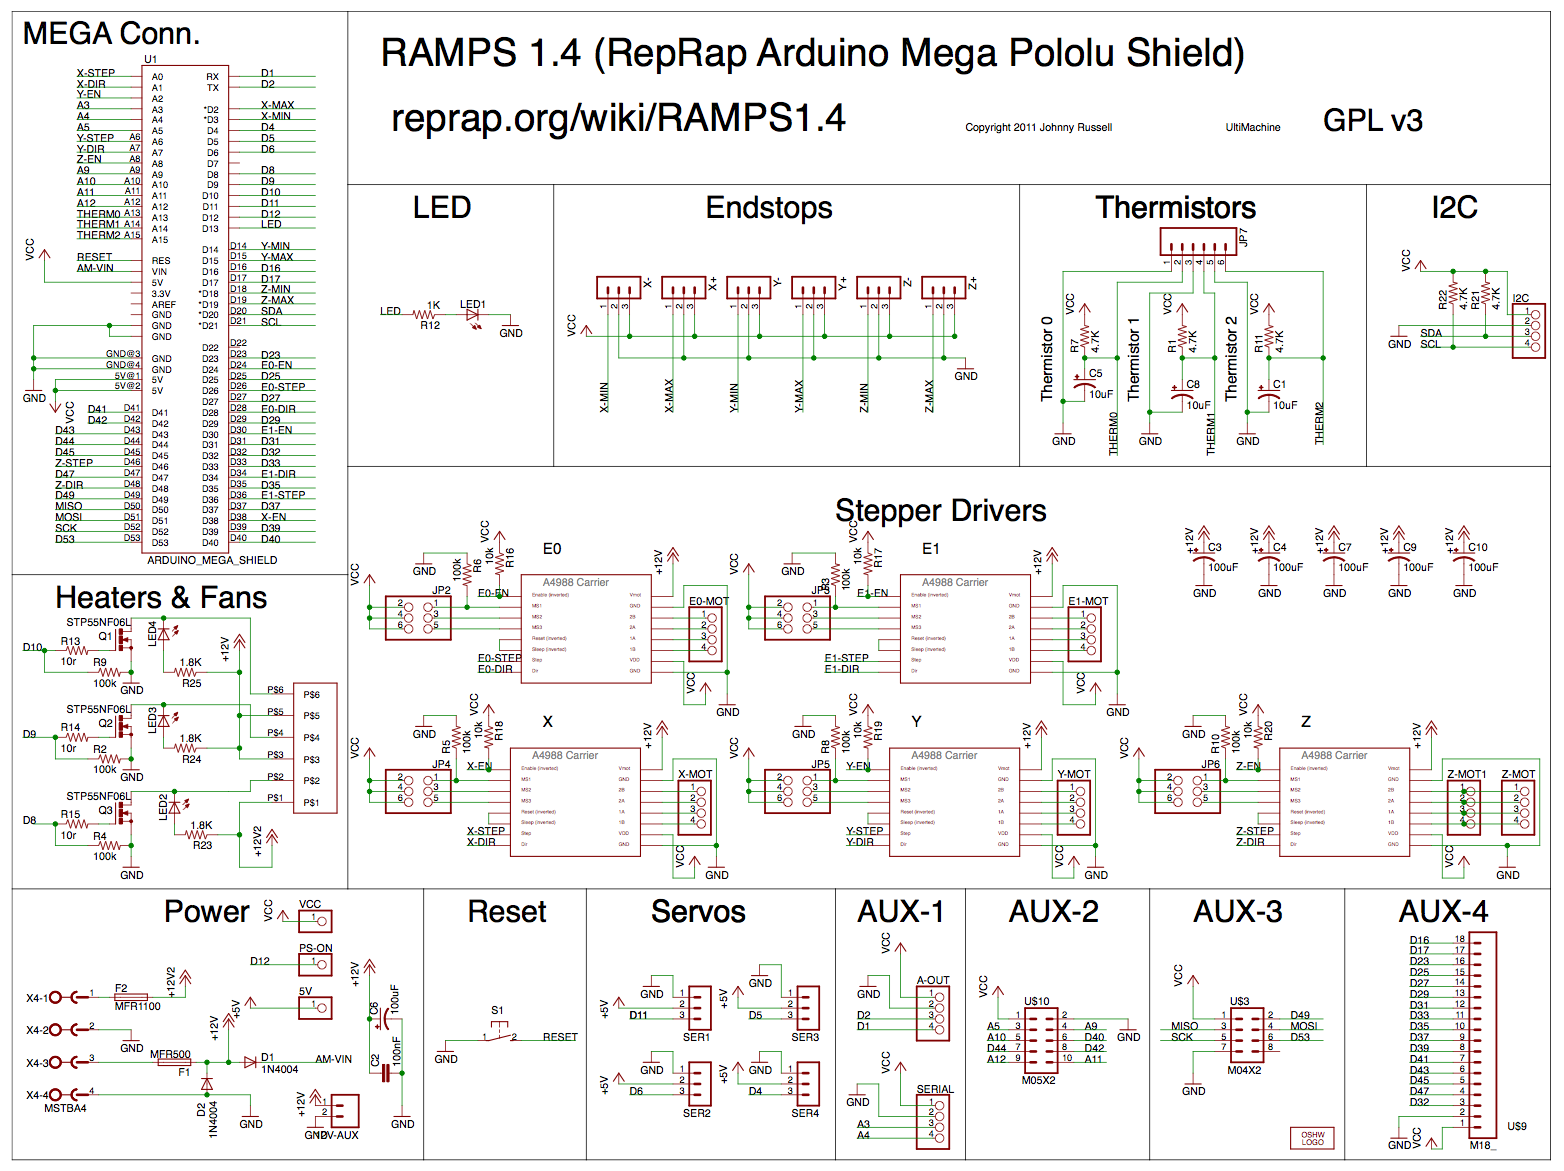 145 | FabAcademy'17 Arduino Mega Schematic on arduino mega 2560 pin mapping, arduino mega adk, arduino mega case, arduino mega 2560 led, breadboard arduino schematic, arduino speaker schematic, arduino microcontroller schematic, arduino r3 schematic, arduino mega 2560 programming, arduino ethernet schematic, arduino nano schematic, arduino mega 2560 datasheet, arduino mega layout, arduino uno schematic, arduino mega specs, arduino mega 2560 board, arduino mega 2560 map, arduino schematic symbol, arduino mega size, arduino pro schematic,